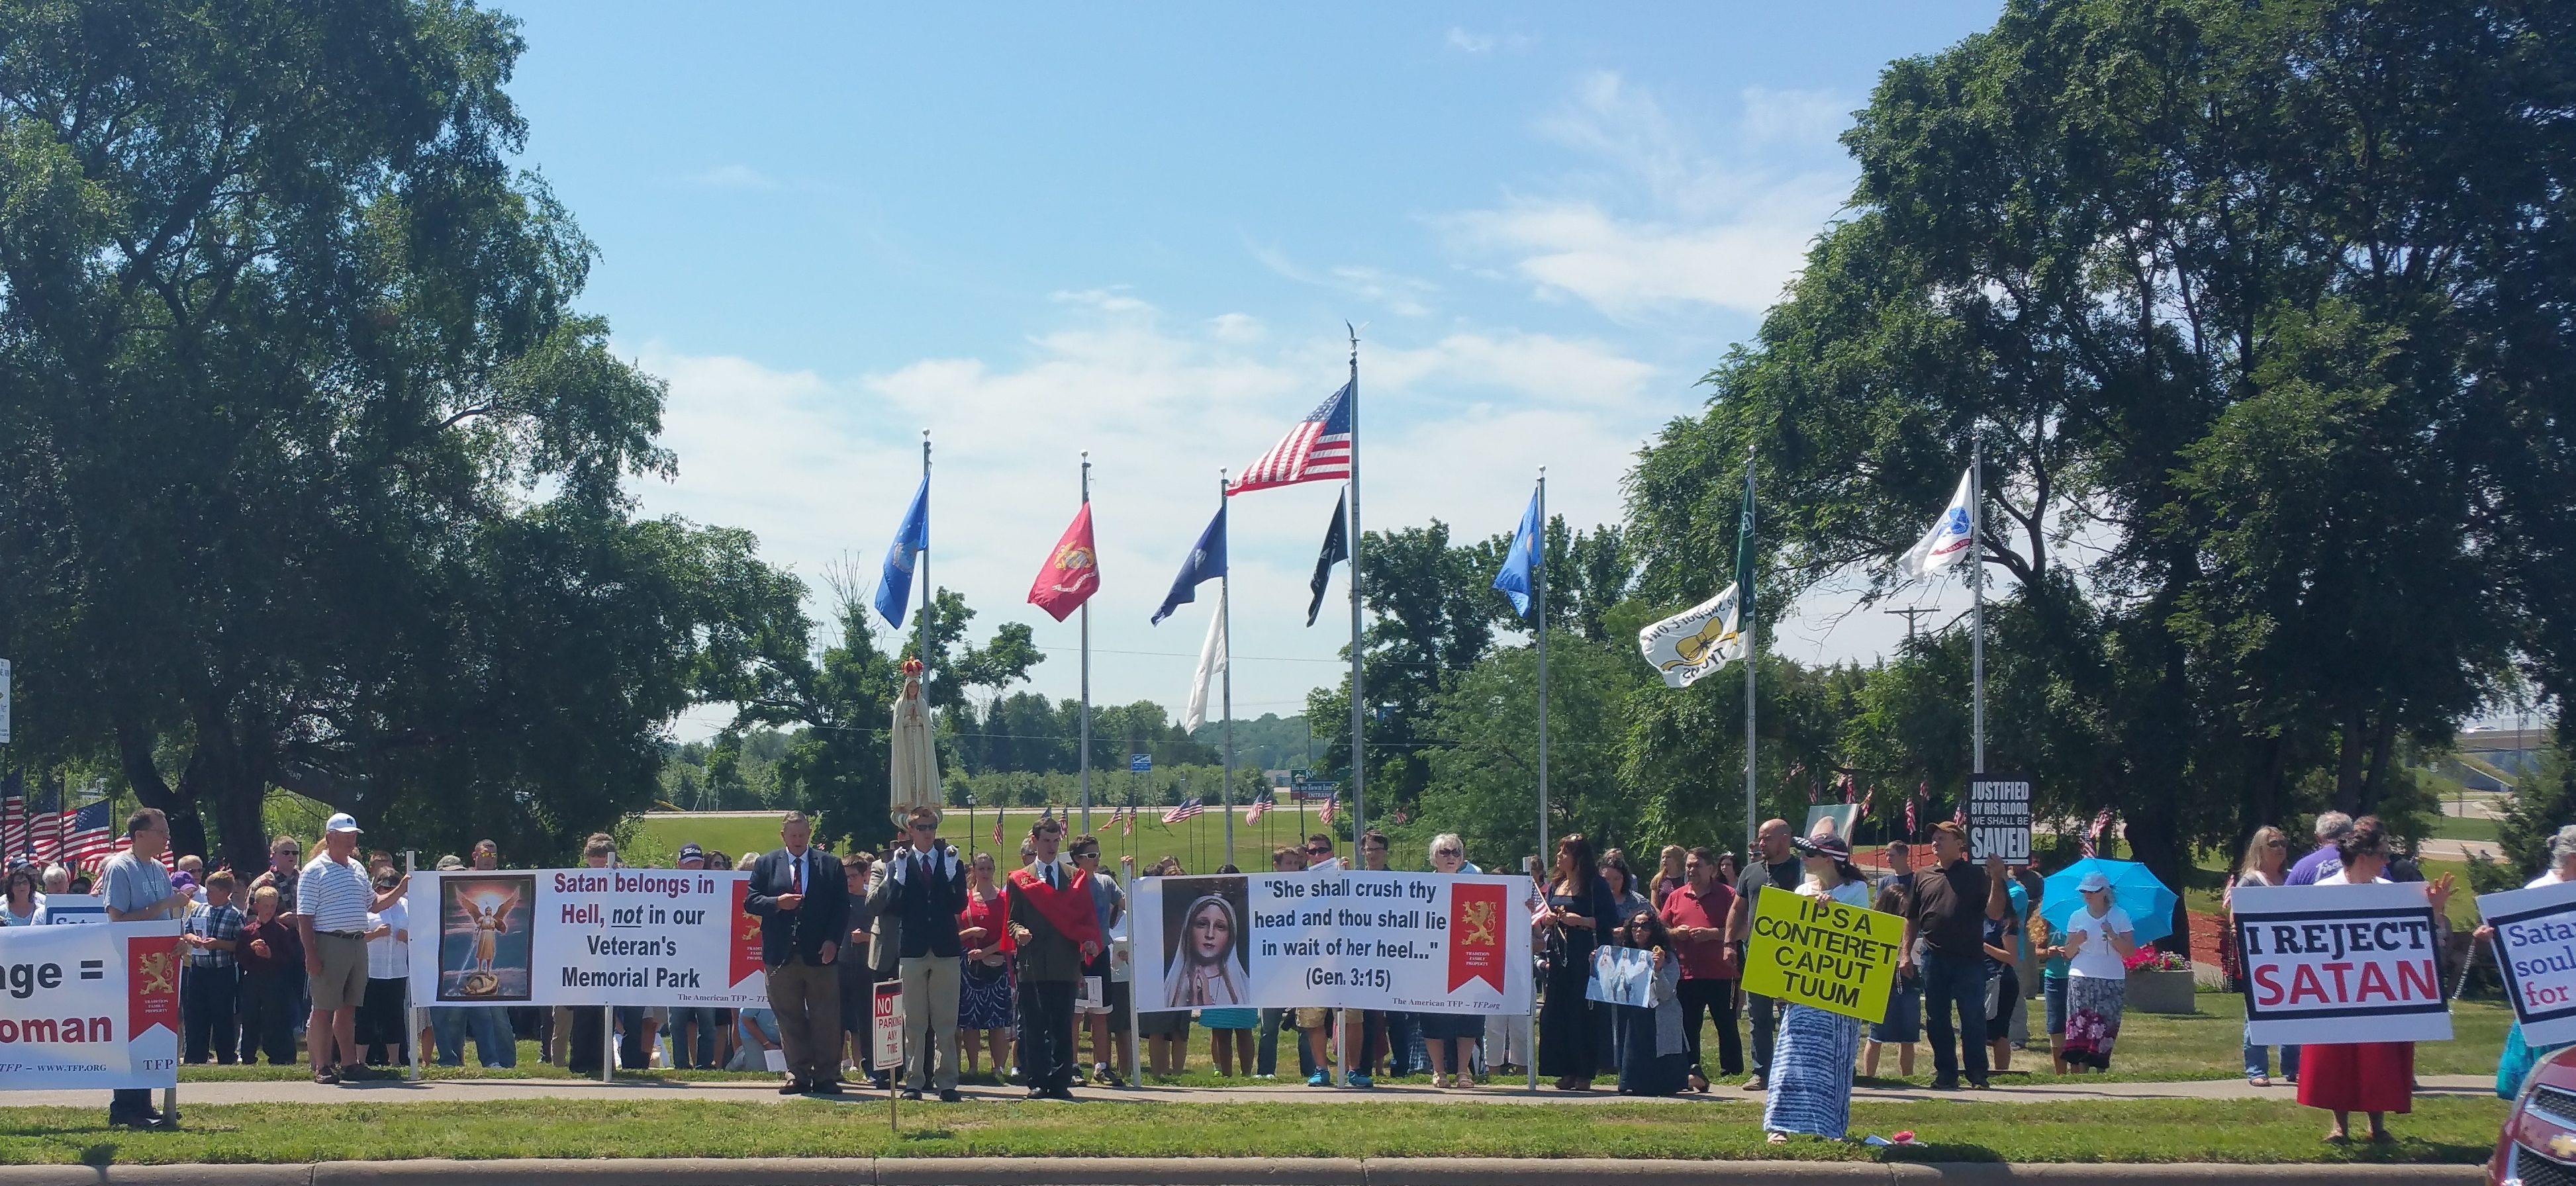 Catholics Reject Satan Monument in Belle Plaine, Minnesota